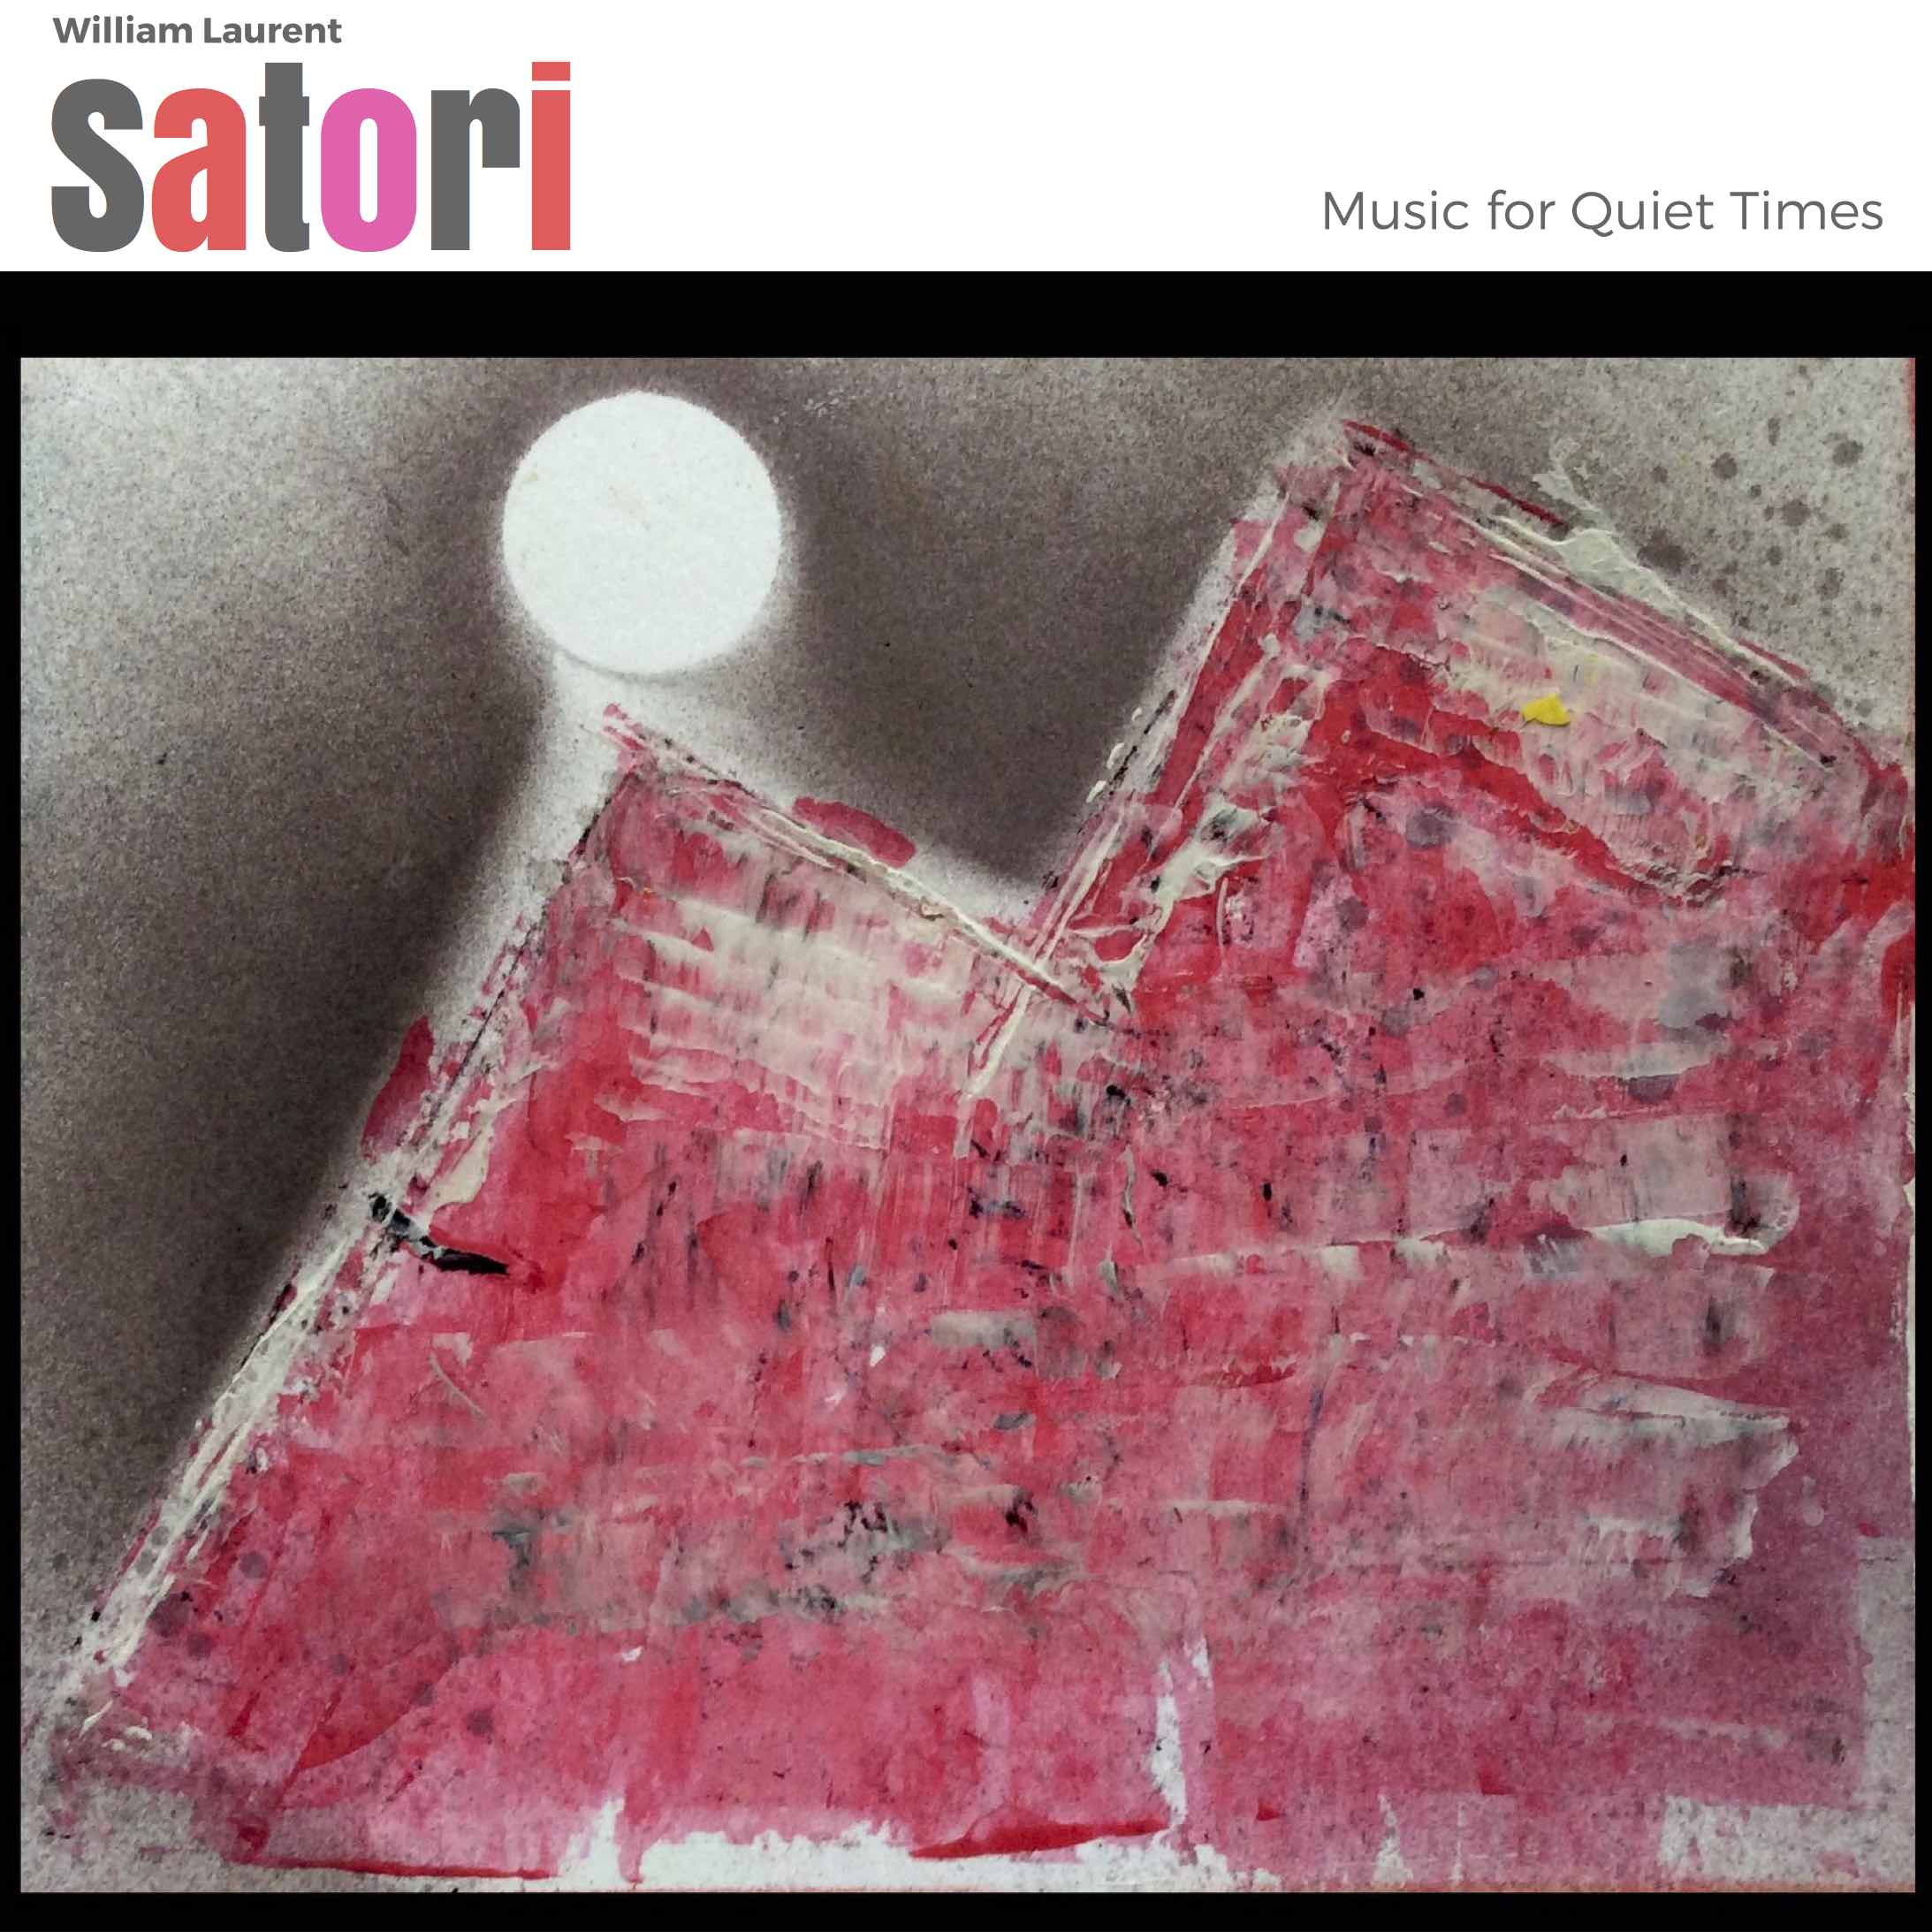 Satori album cover - web resolution.jpg